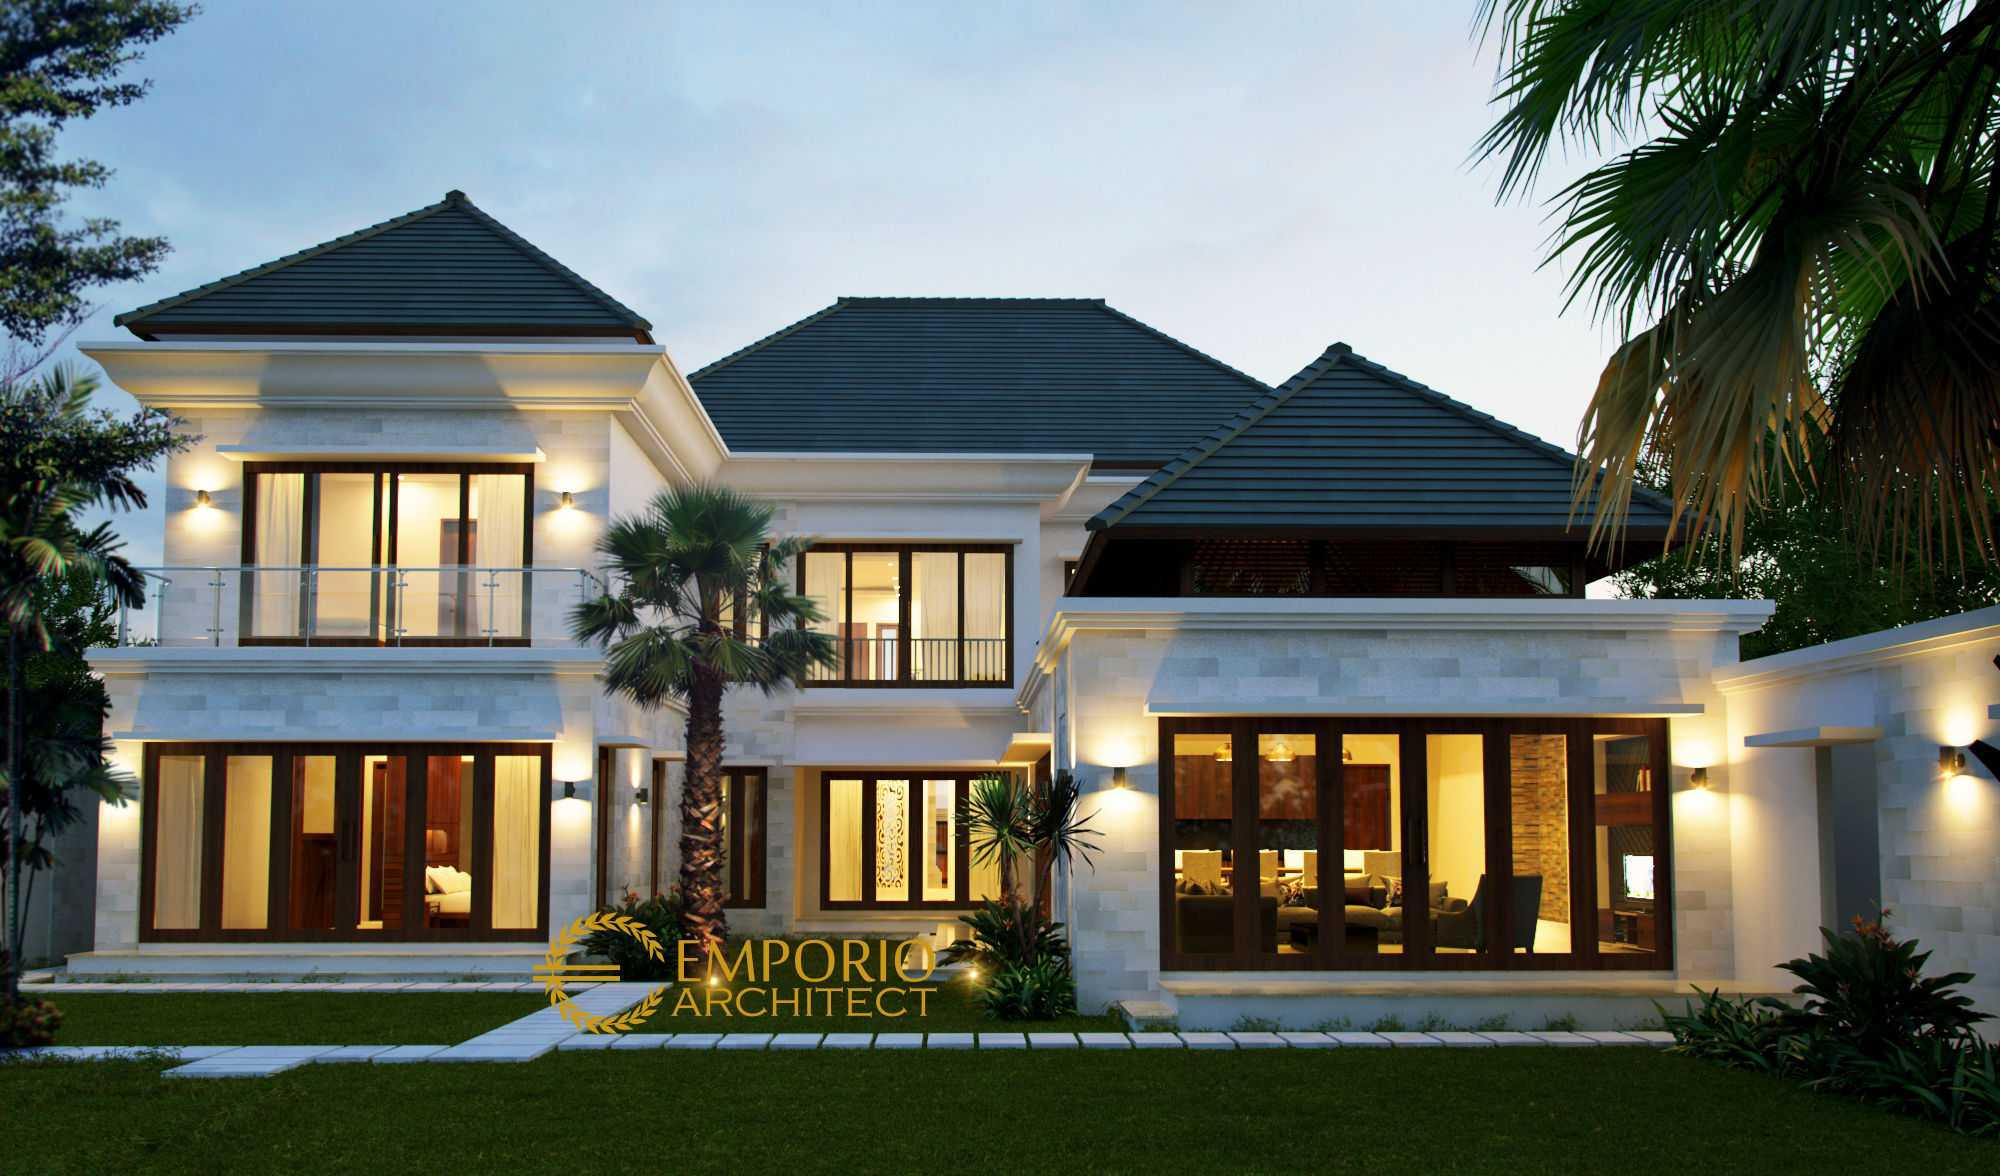 Emporio Architect Jasa Arsitek Denpasar Desain Rumah Villa Bali Tropis 216 @ Denpasar, Bali Kota Denpasar, Bali, Indonesia Kota Denpasar, Bali, Indonesia Emporio-Architect-Jasa-Arsitek-Denpasar-Desain-Rumah-Villa-Bali-Tropis-216-Denpasar-Bali  84009